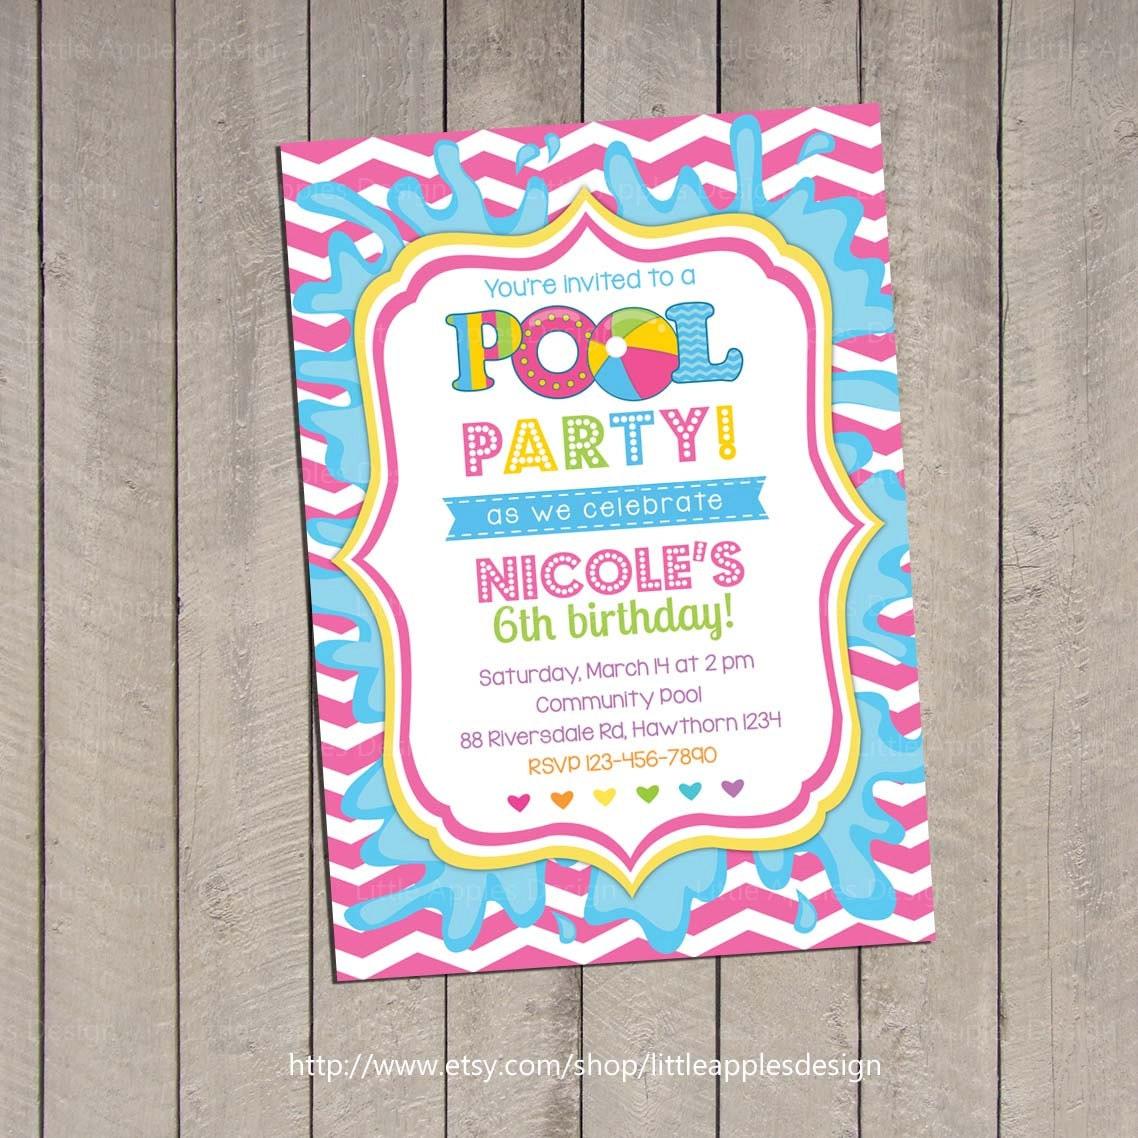 1 Year Old Birthday Invitation Ideas for best invitation sample